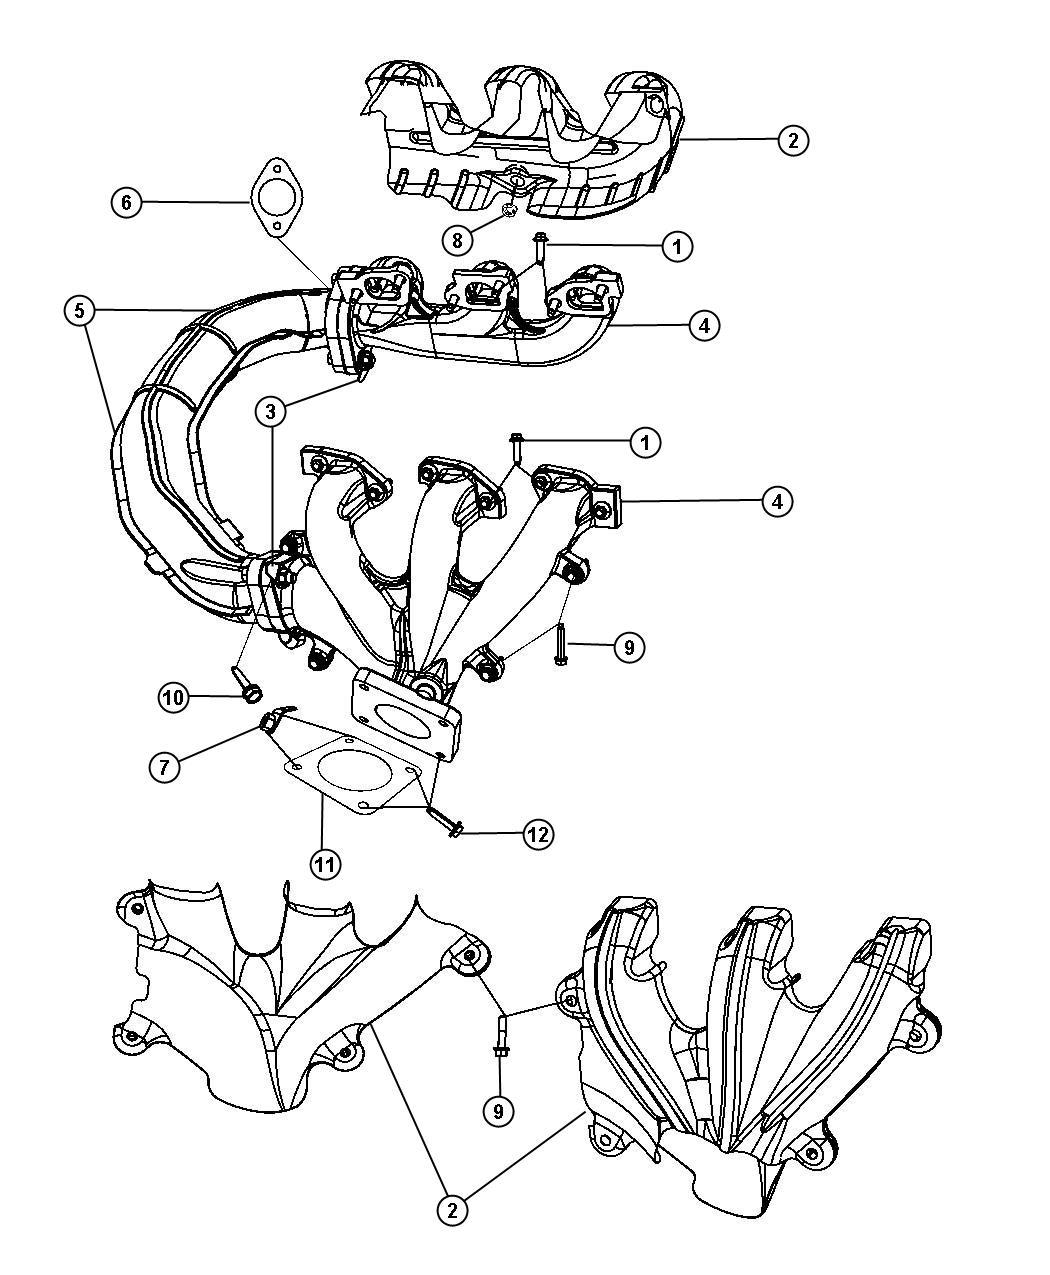 Dodge Dakota Gasket. Exhaust manifold to front converter